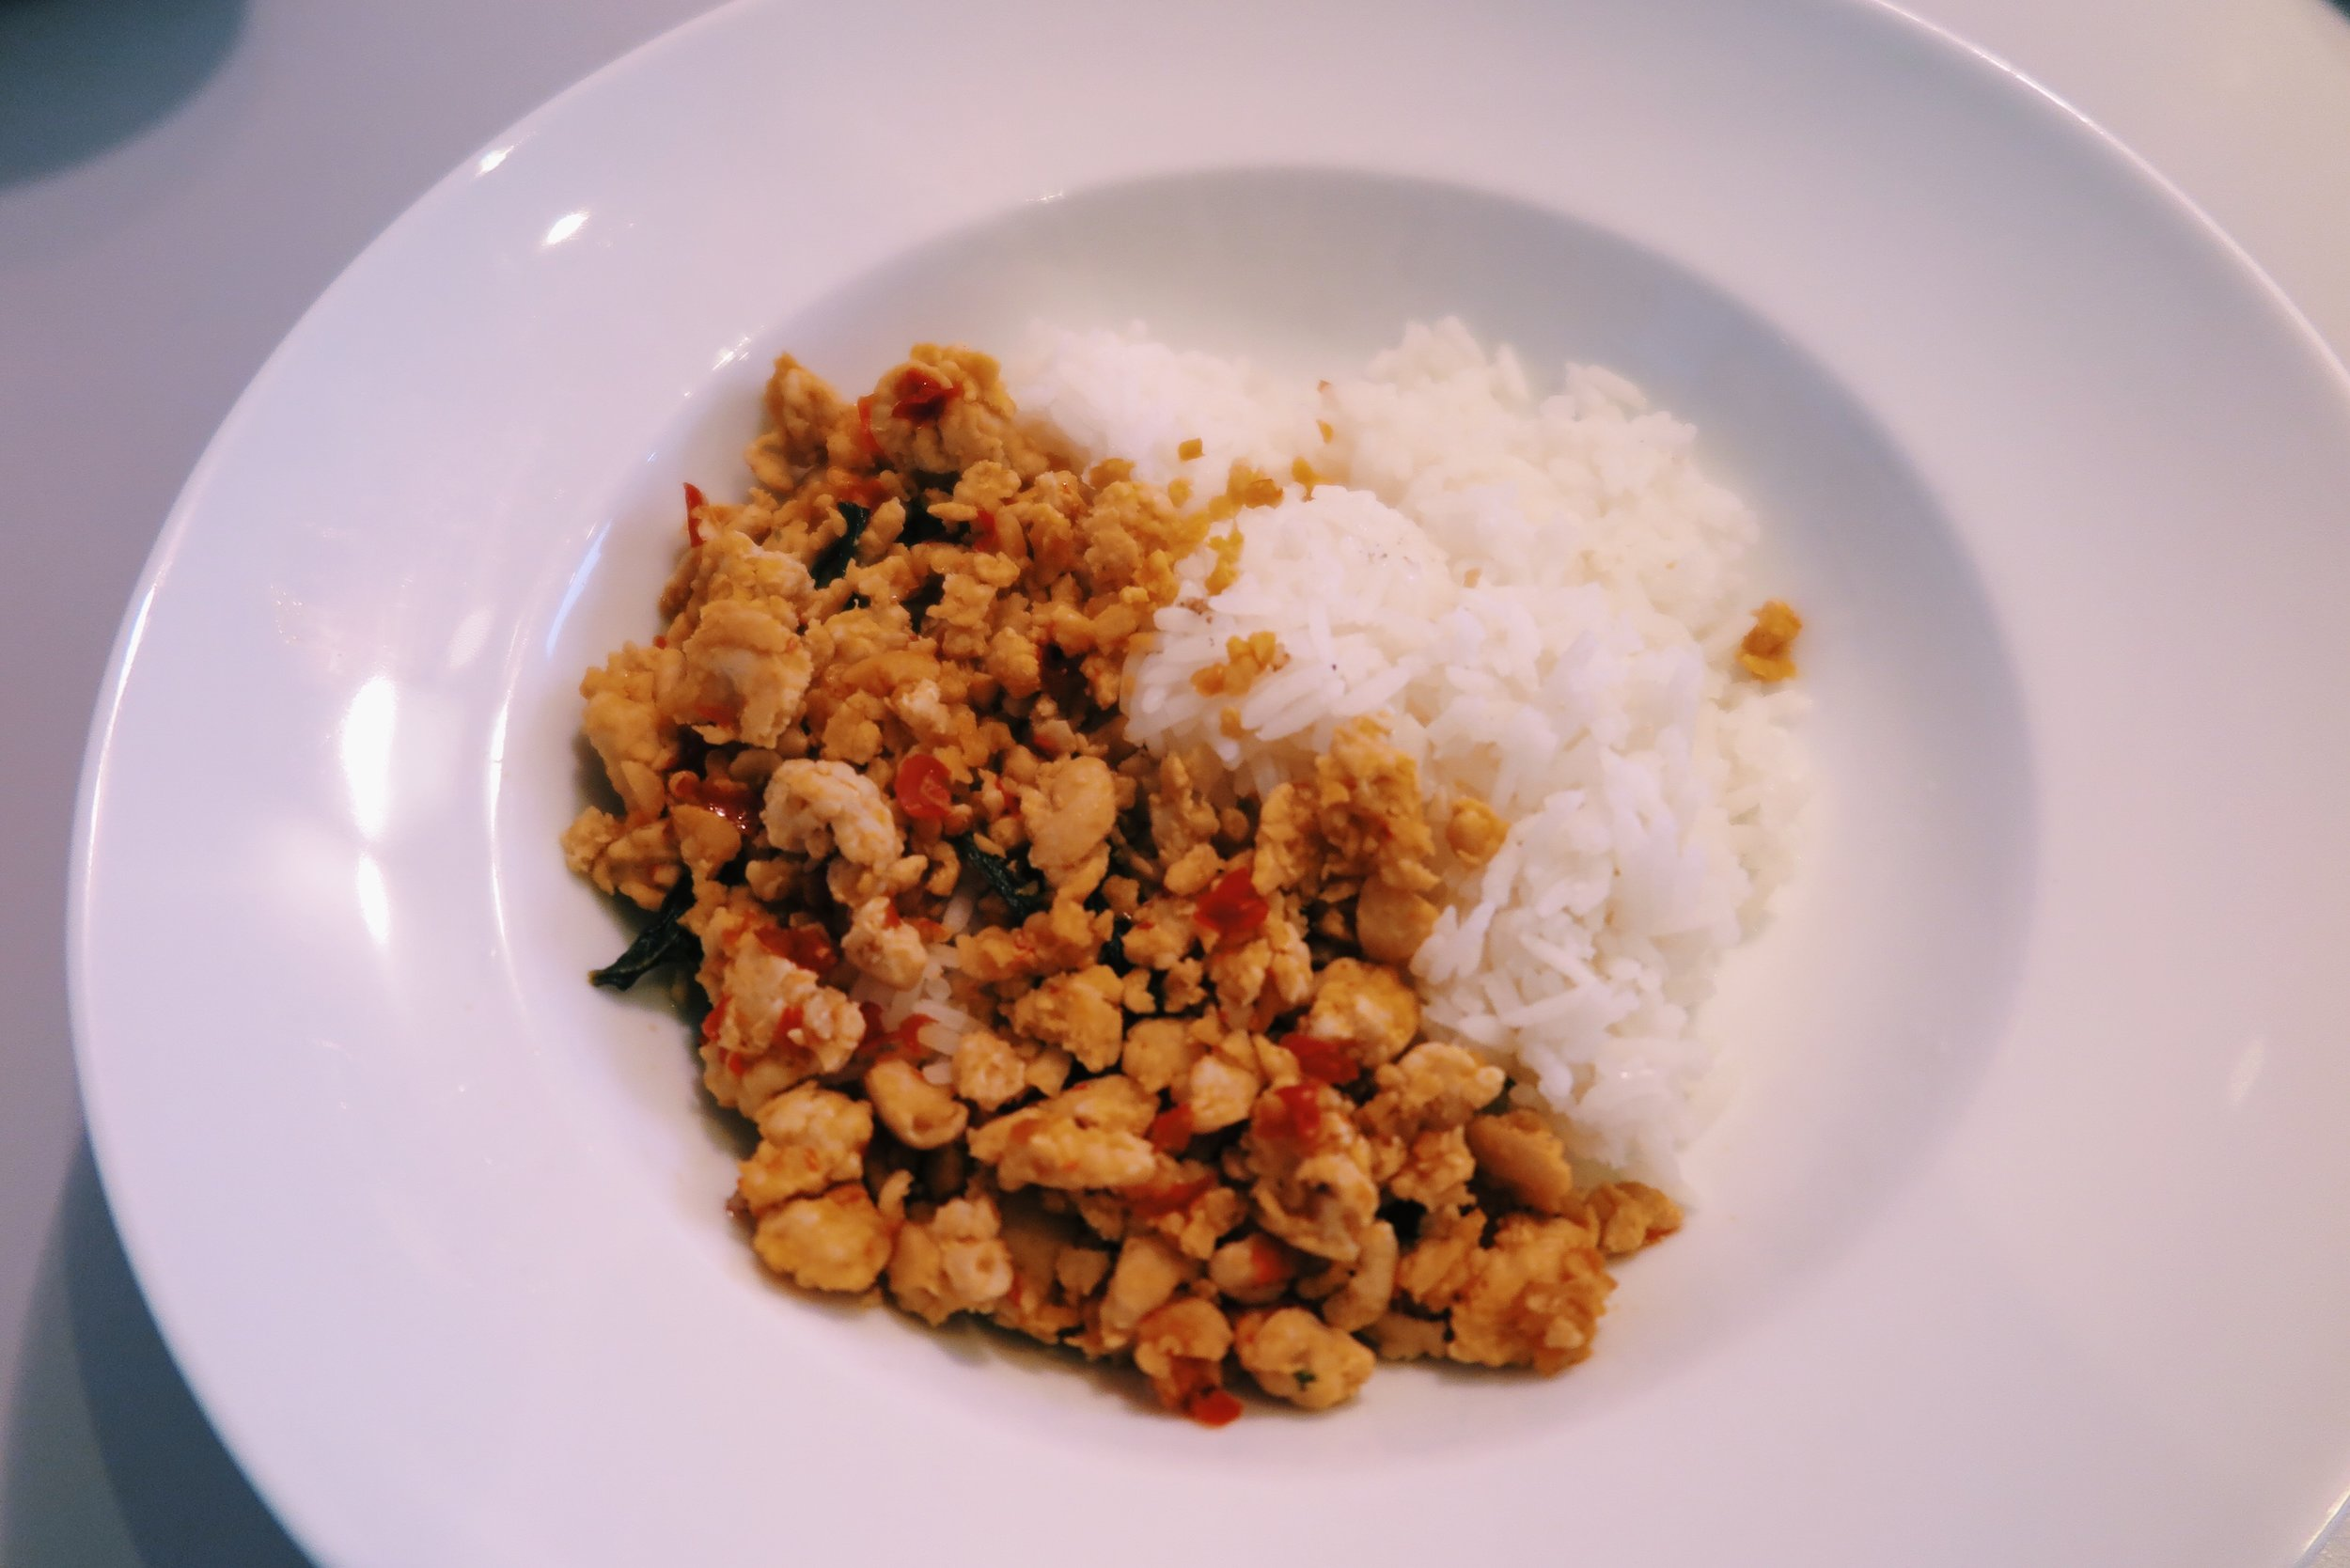 4.  Pad kra pao (spicy Thai chicken + basil) + rice